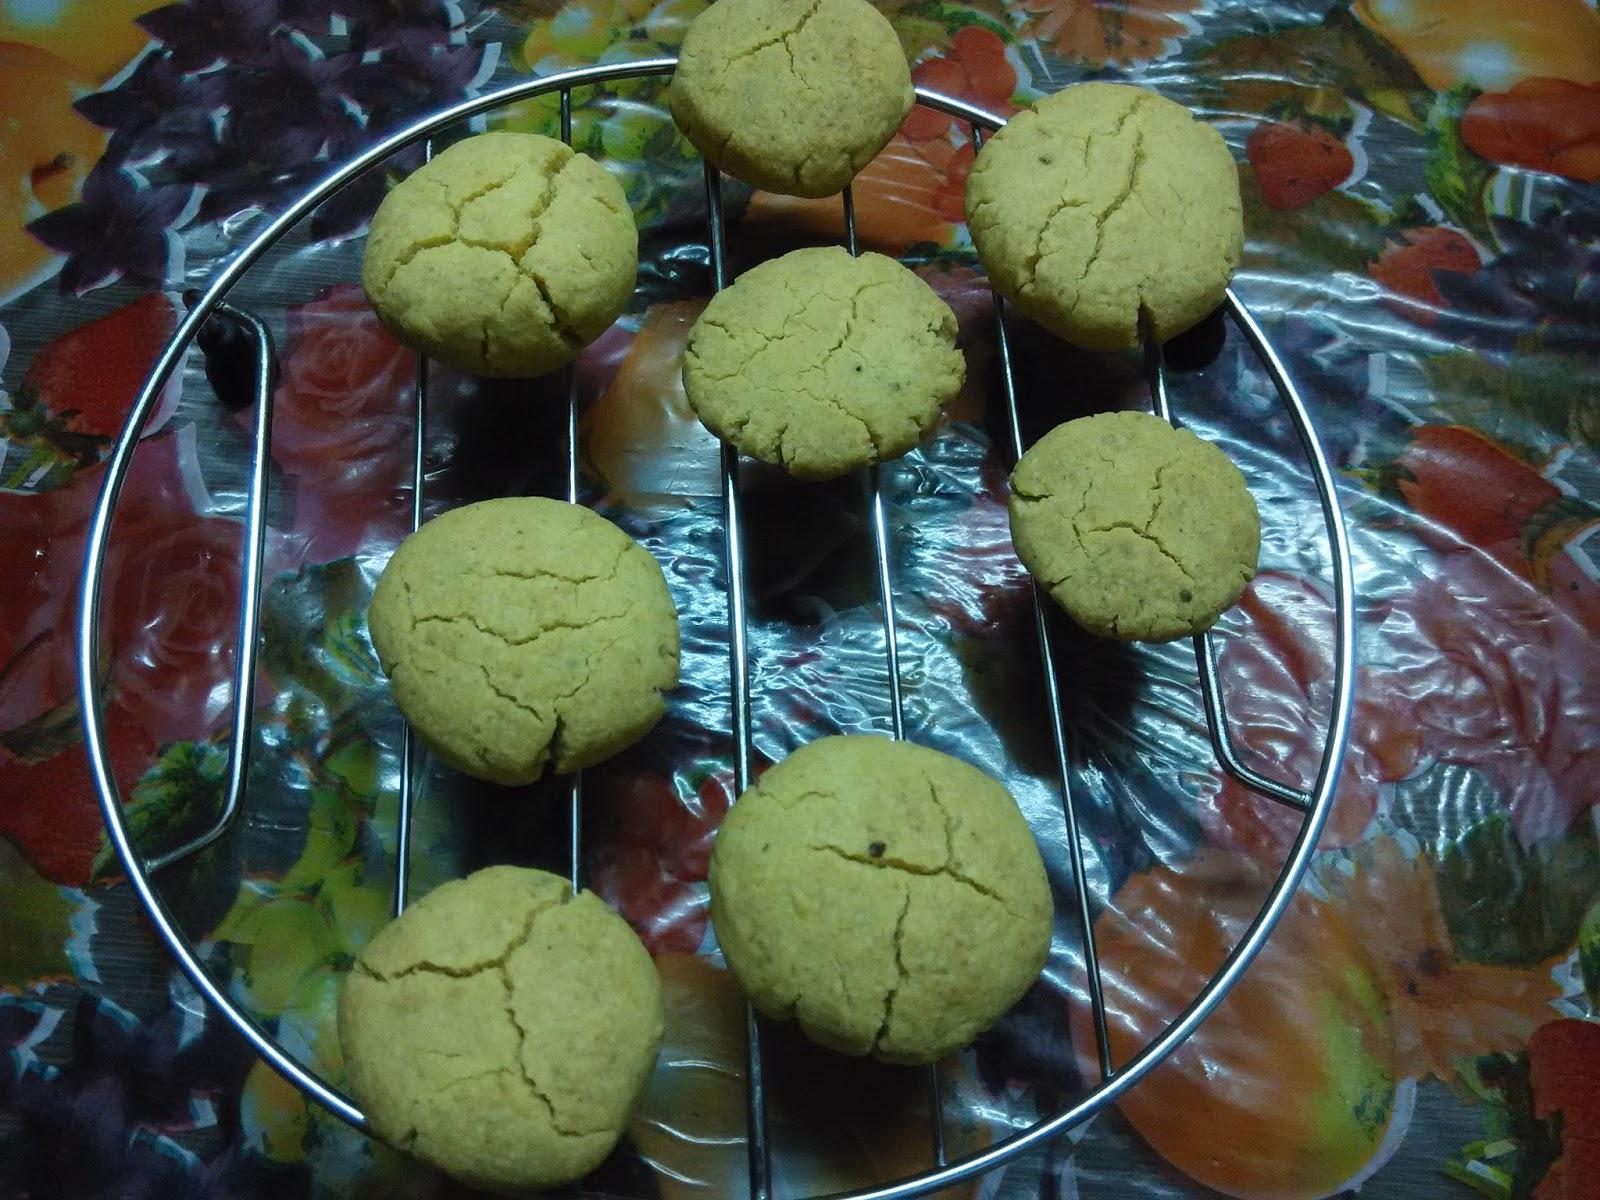 Here S The Second Nankhatai Recipe That Uses Baking Powder